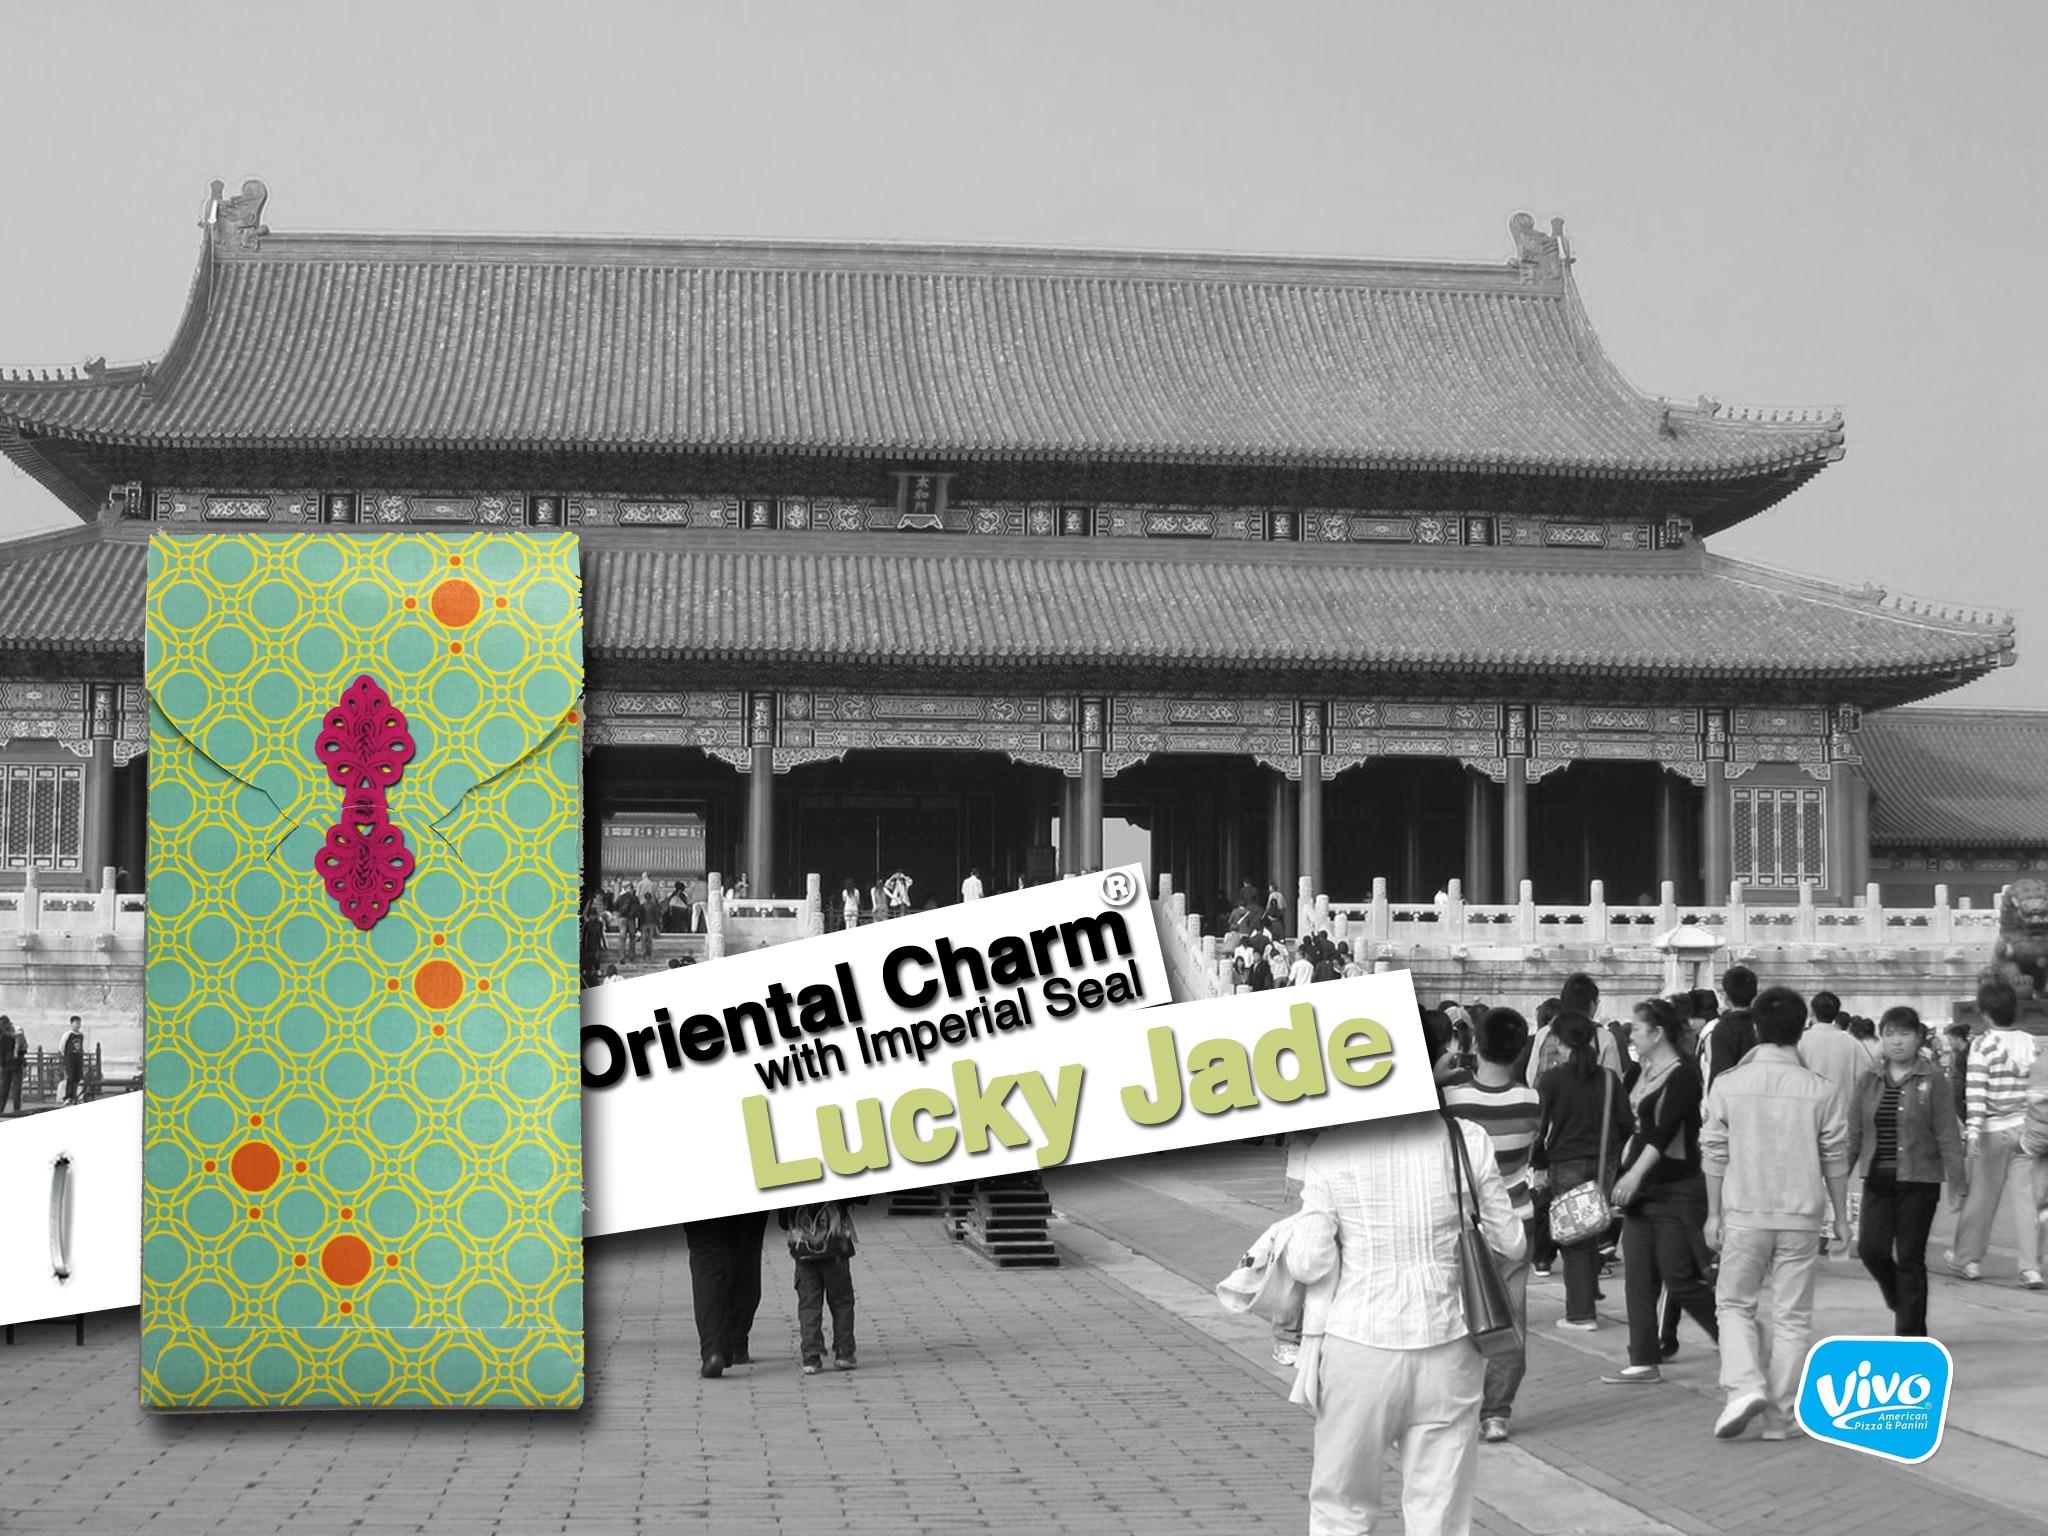 Oriental Charm Lucky Jade